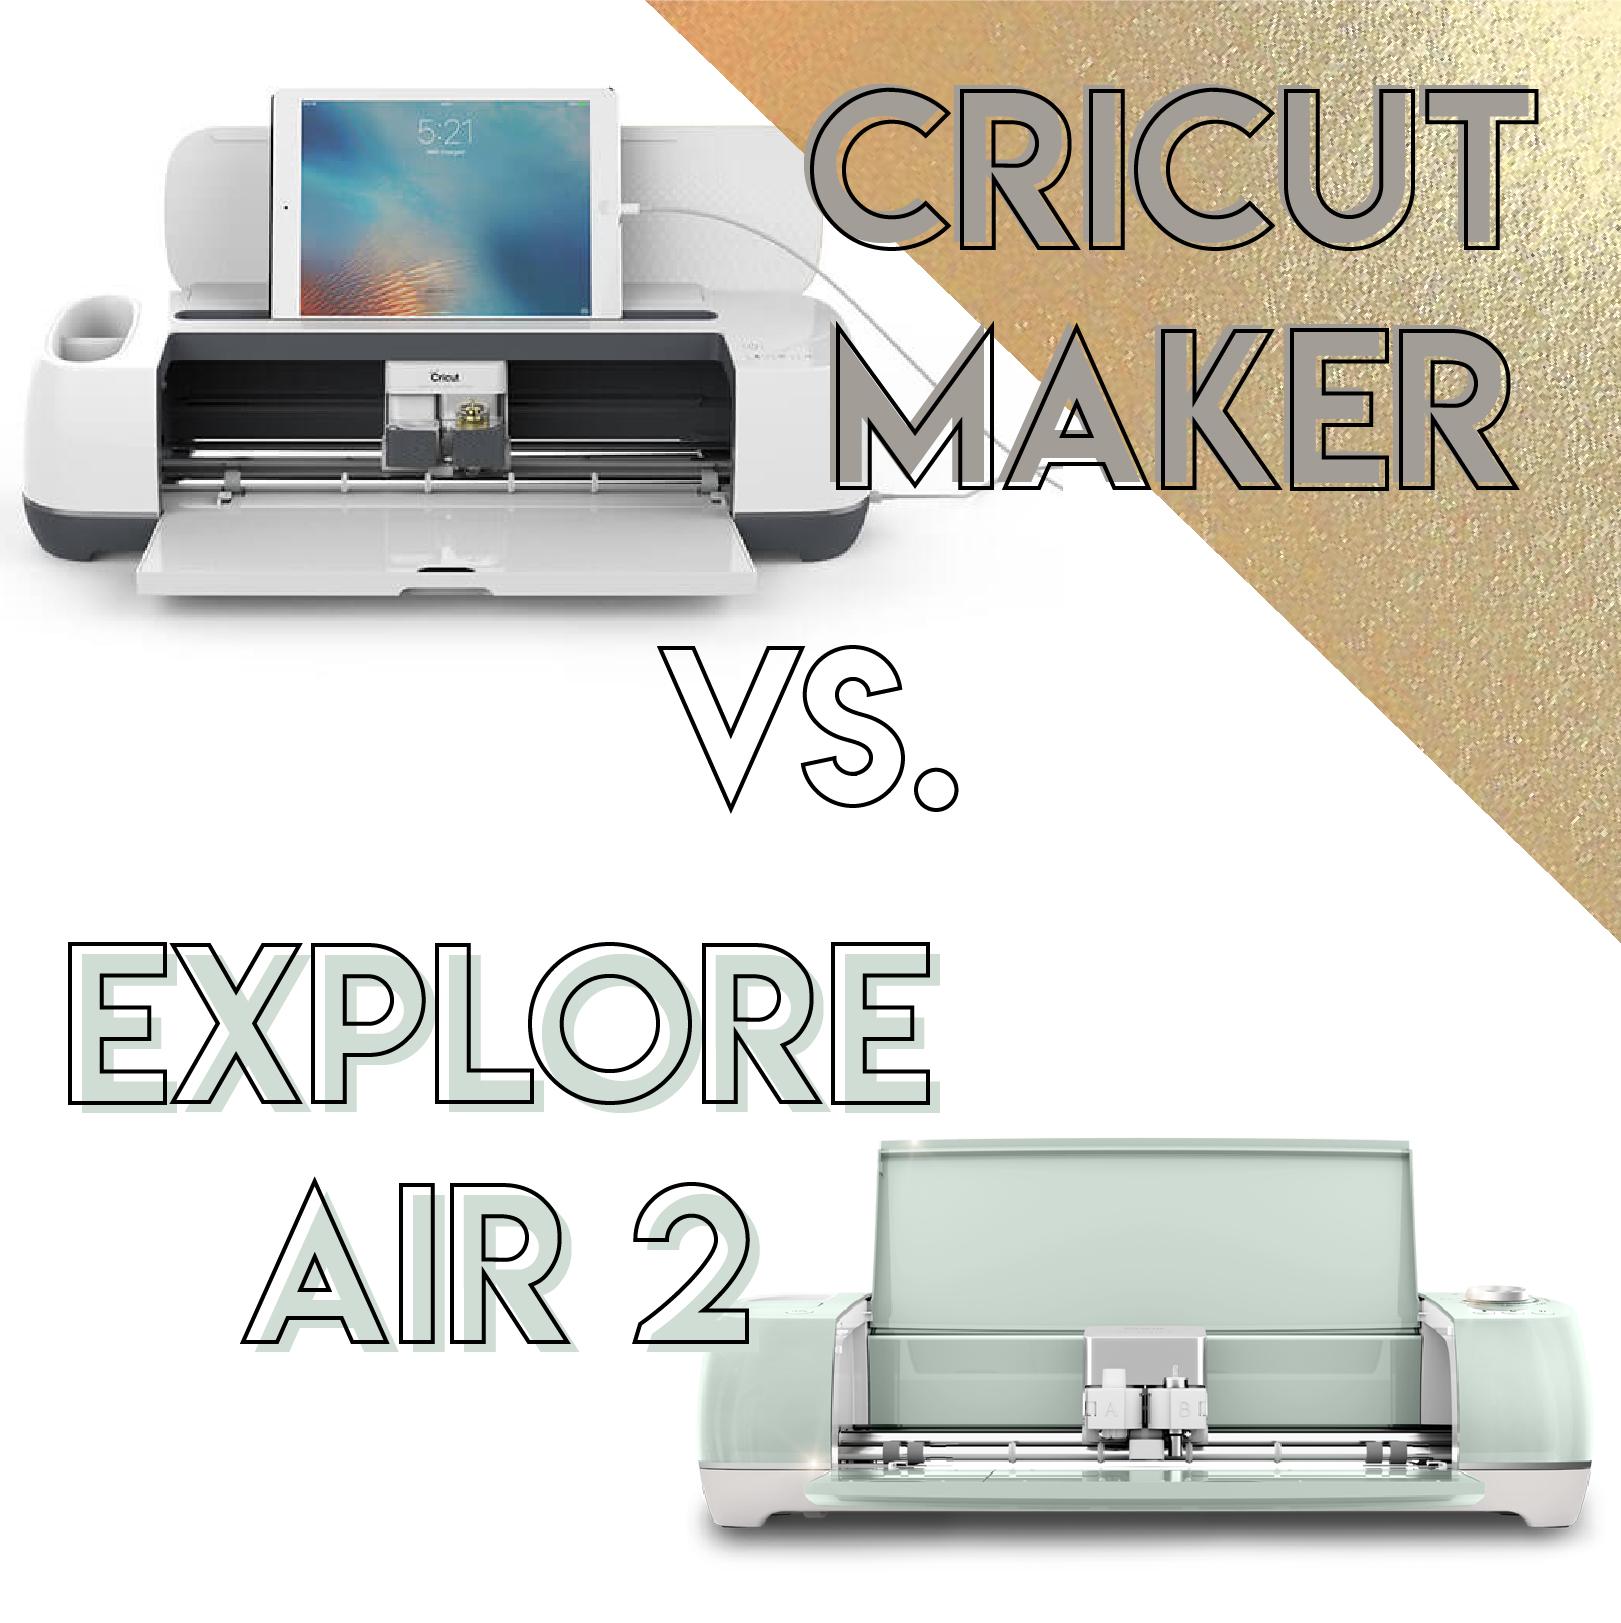 Cricut Explore Air 2 vs. Cricut Maker Comparison: Read This Before Buying!